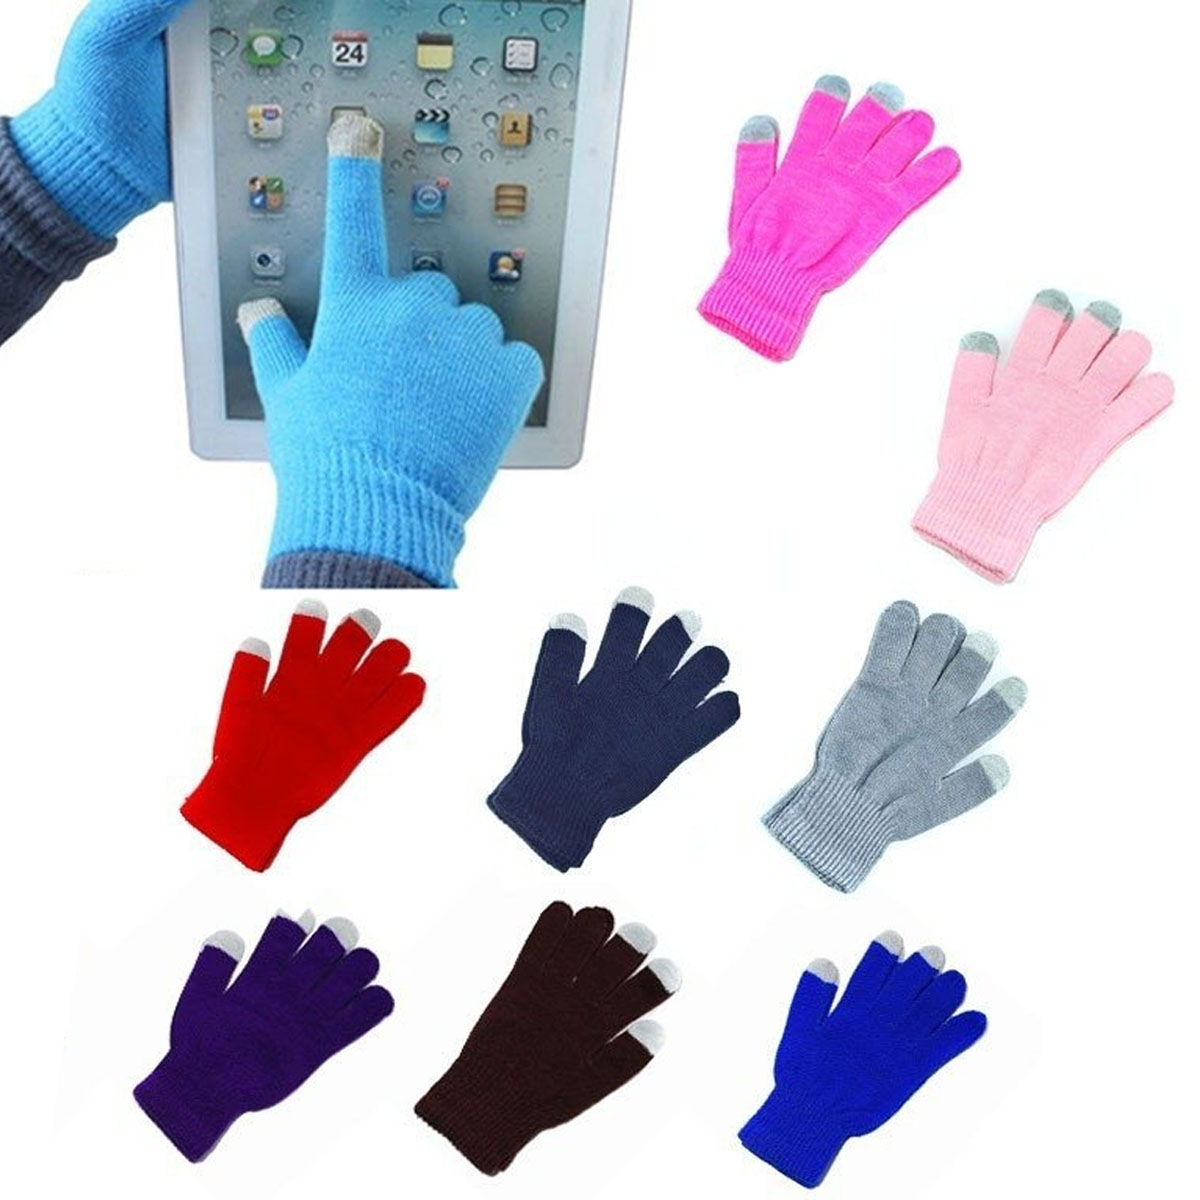 Guantes Touch De Lana Tejido Tablet Celular Invierno Colores